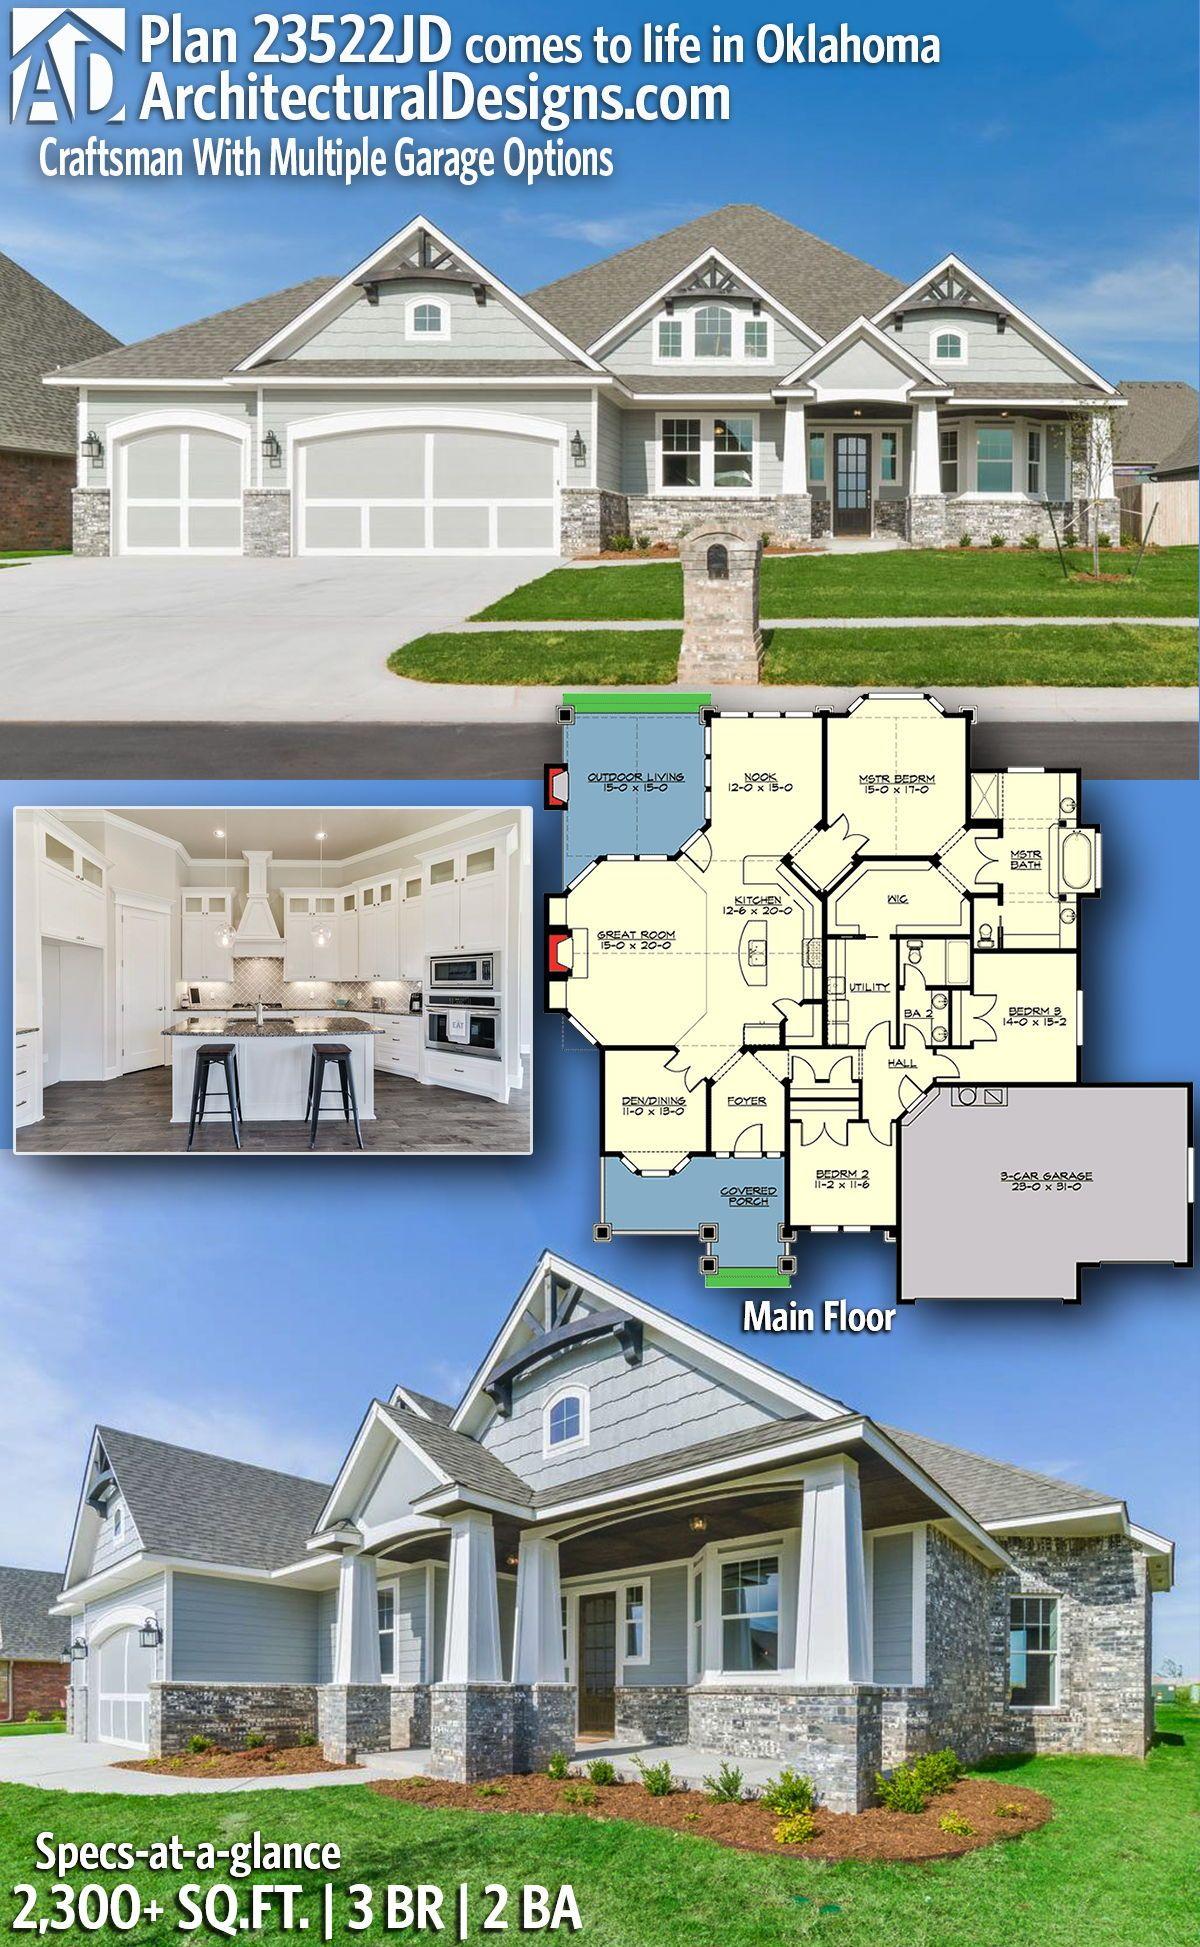 Plan 23522jd Craftsman With Multiple Garage Options Craftsman House Plans Home Design Floor Plans Architecture House